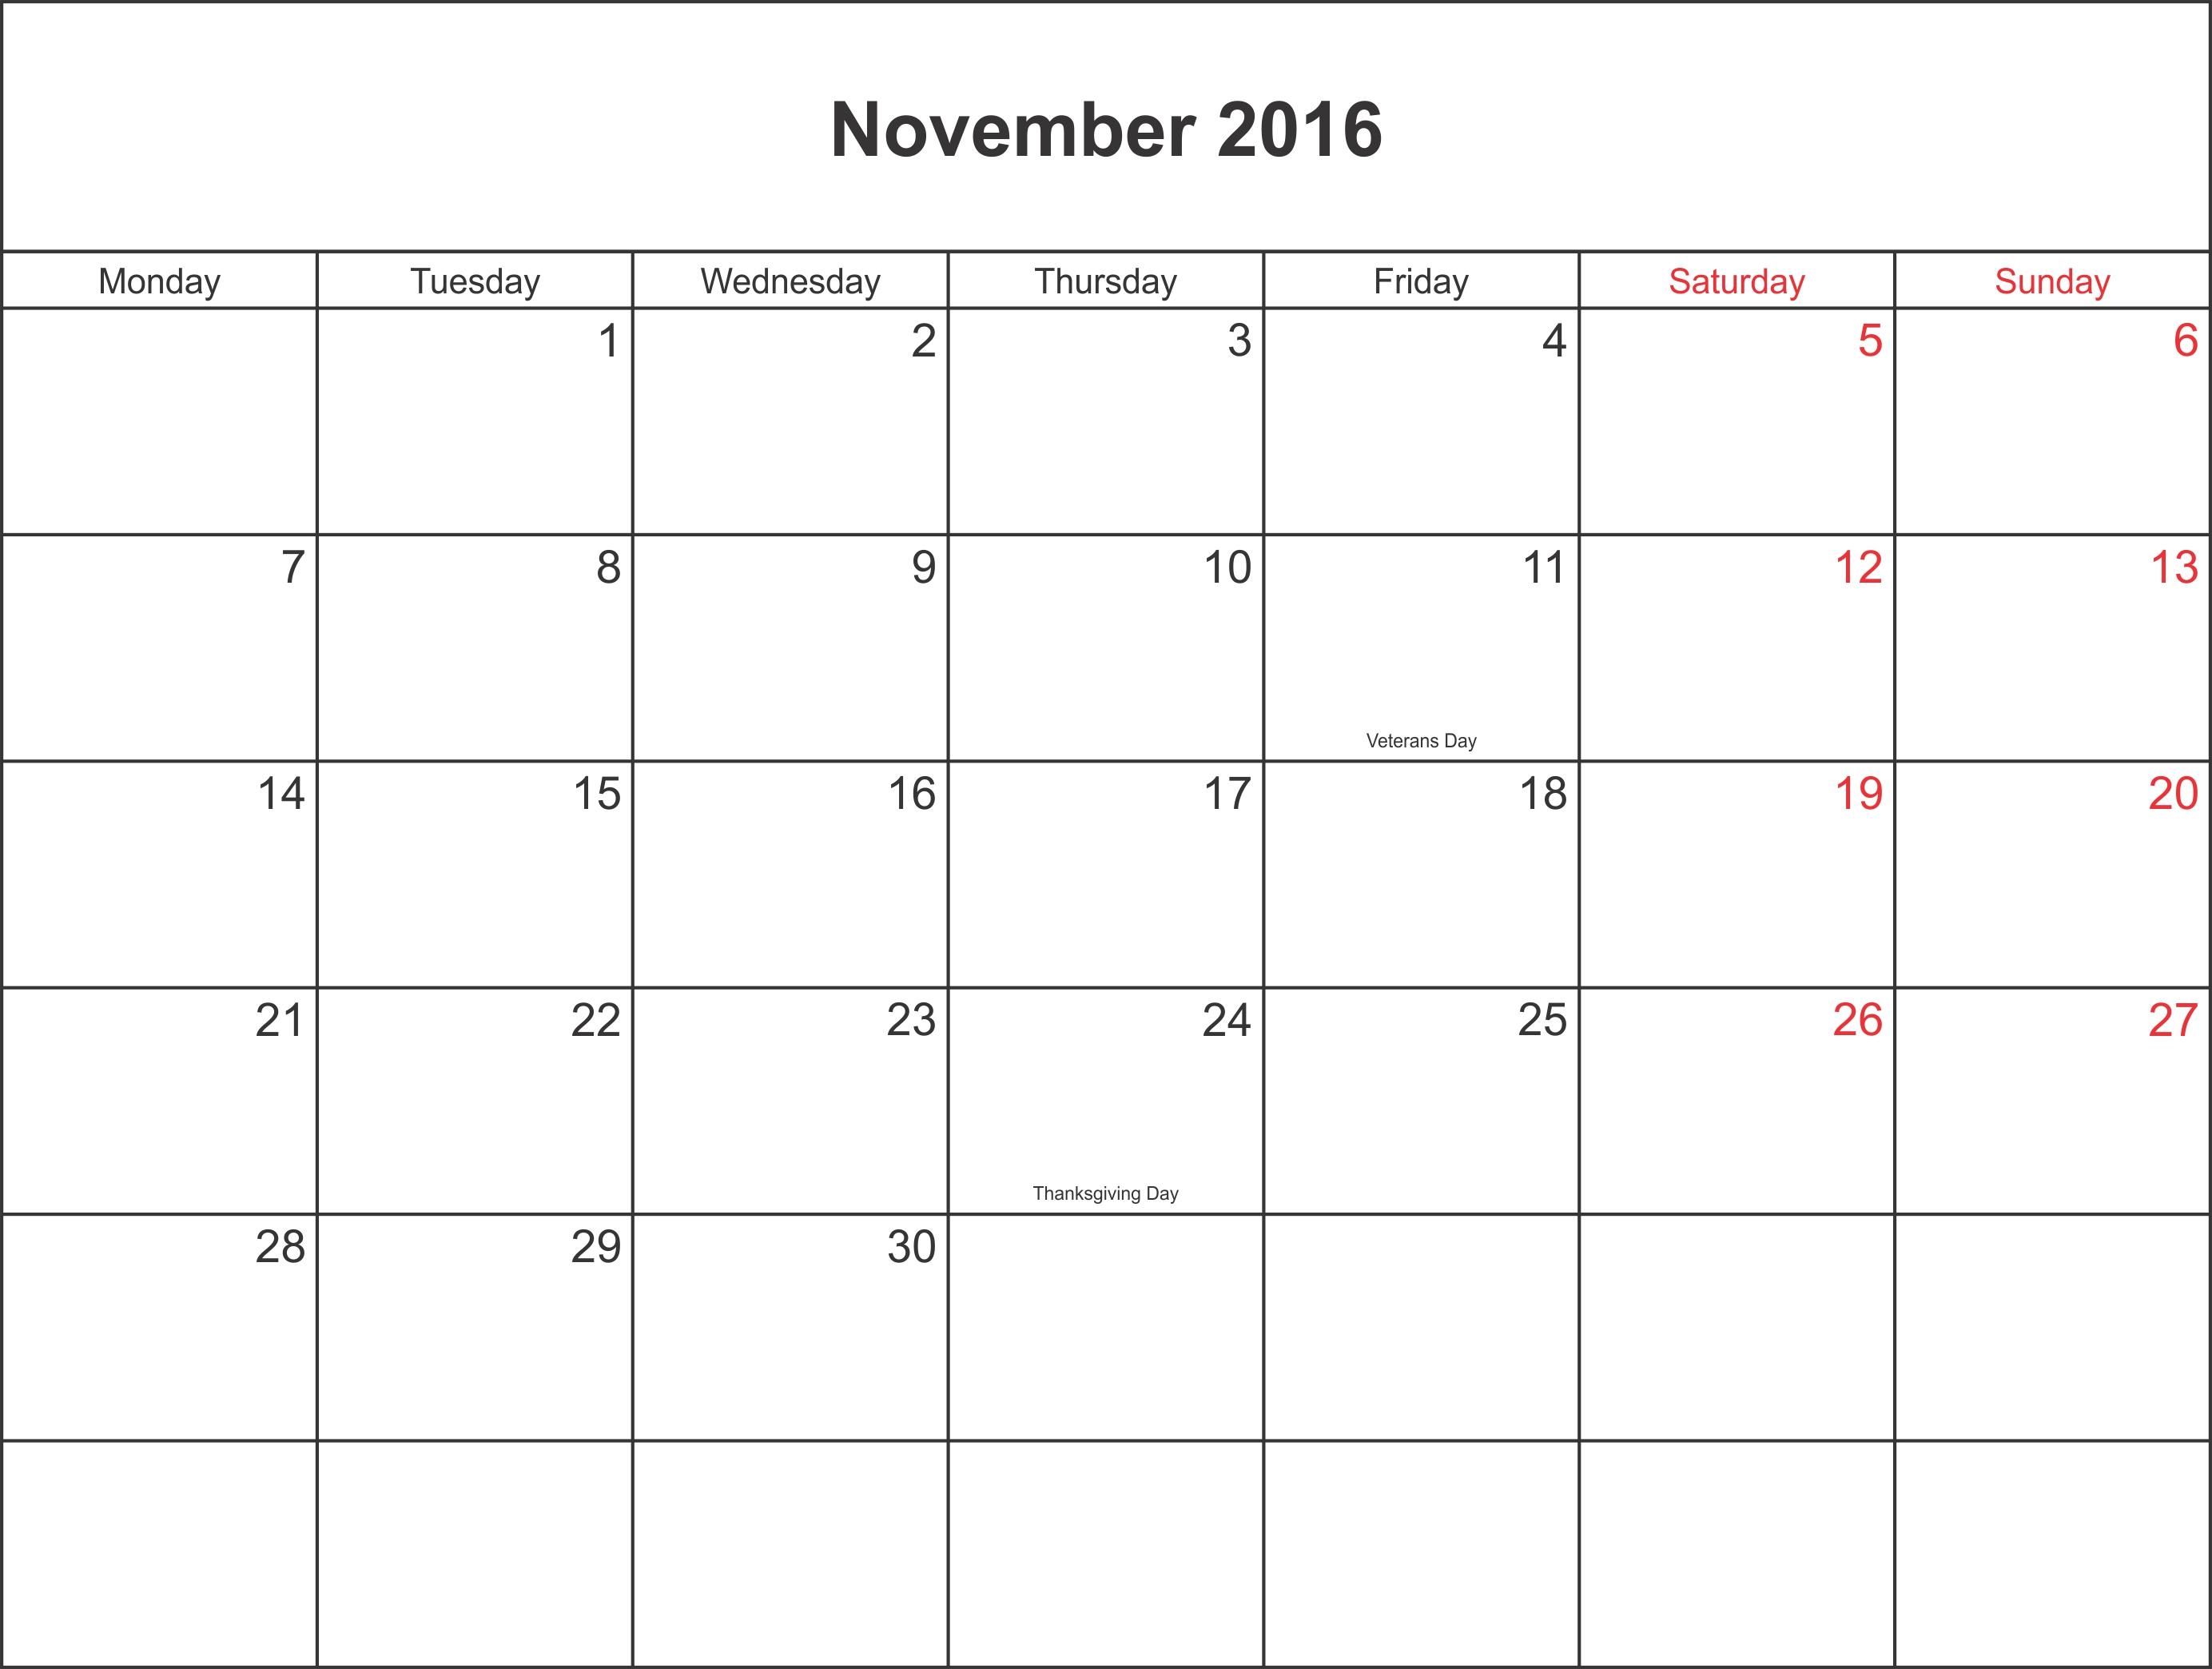 November 2016 Calendar Printable With Holidays with regard to Holidays Calendar Templates November